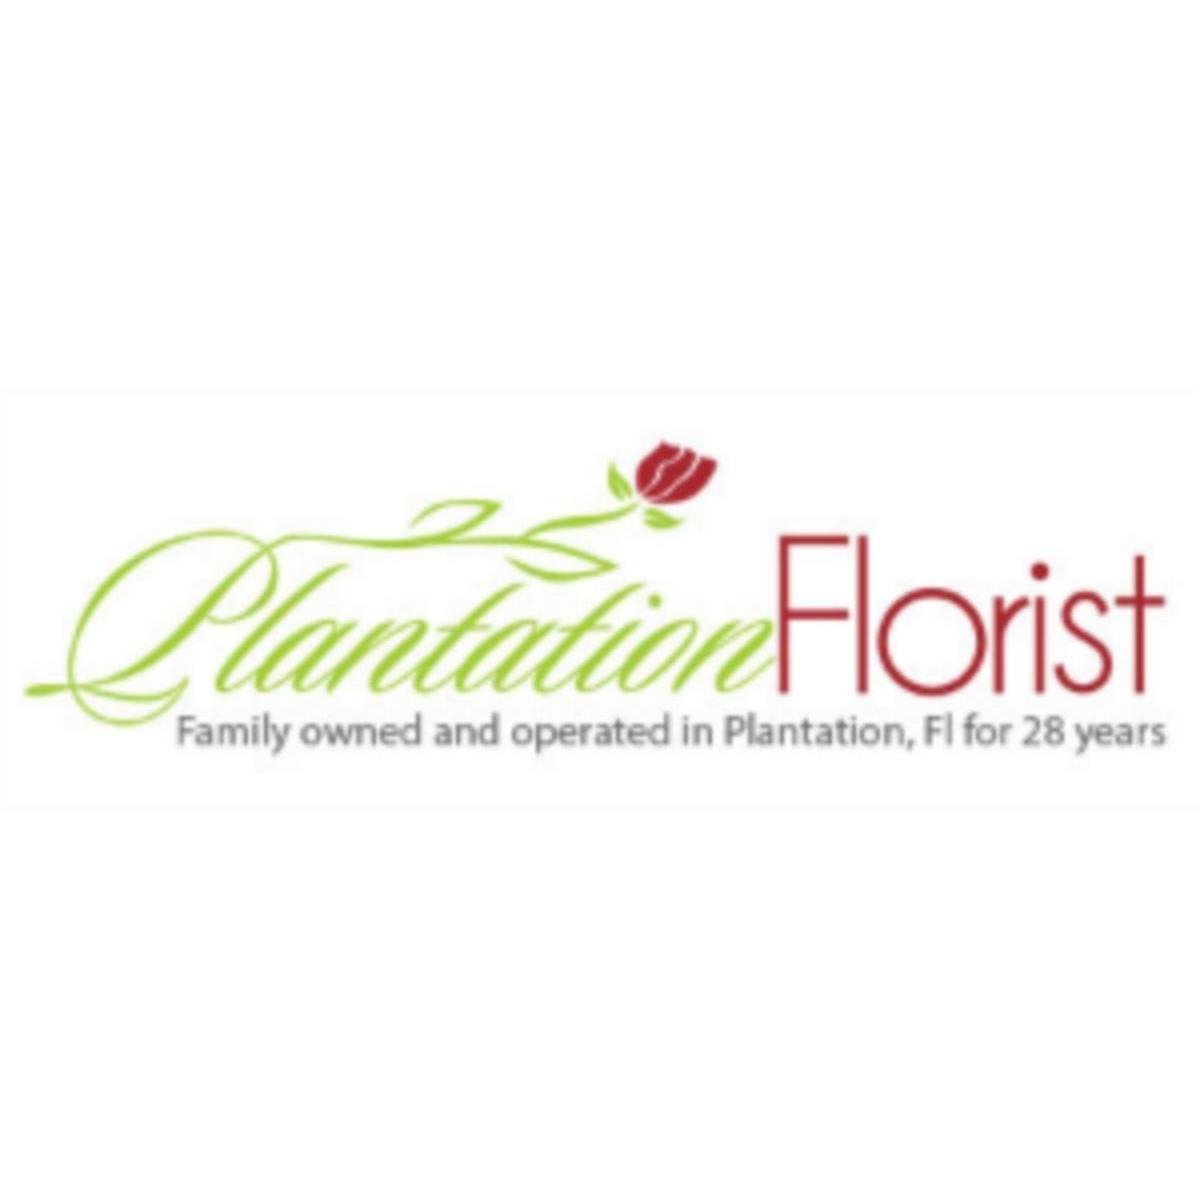 Plantation Florist Floral Promotions Inc Coupons near me in Plantation